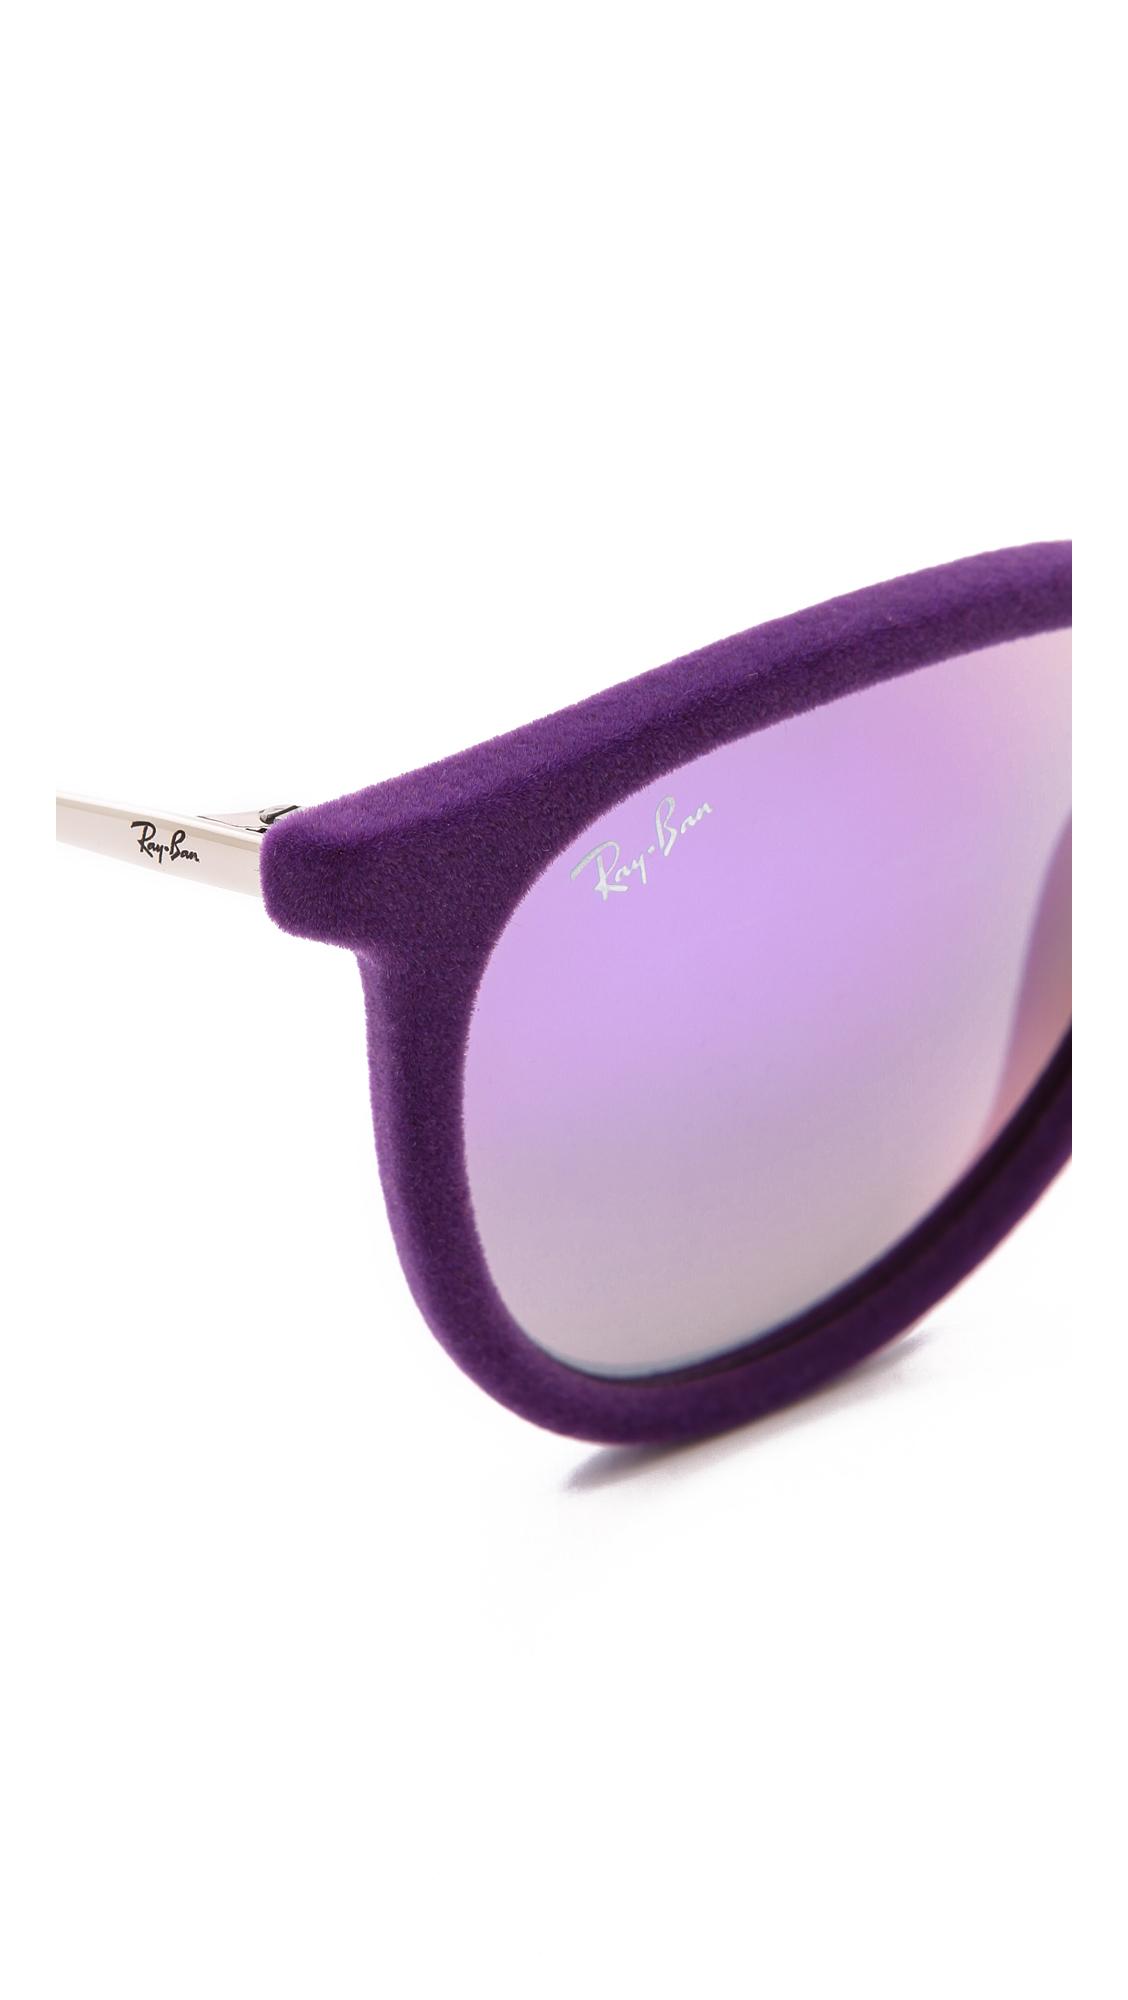 7d46bab3ad Ray-Ban Erika Velvet Sunglasses